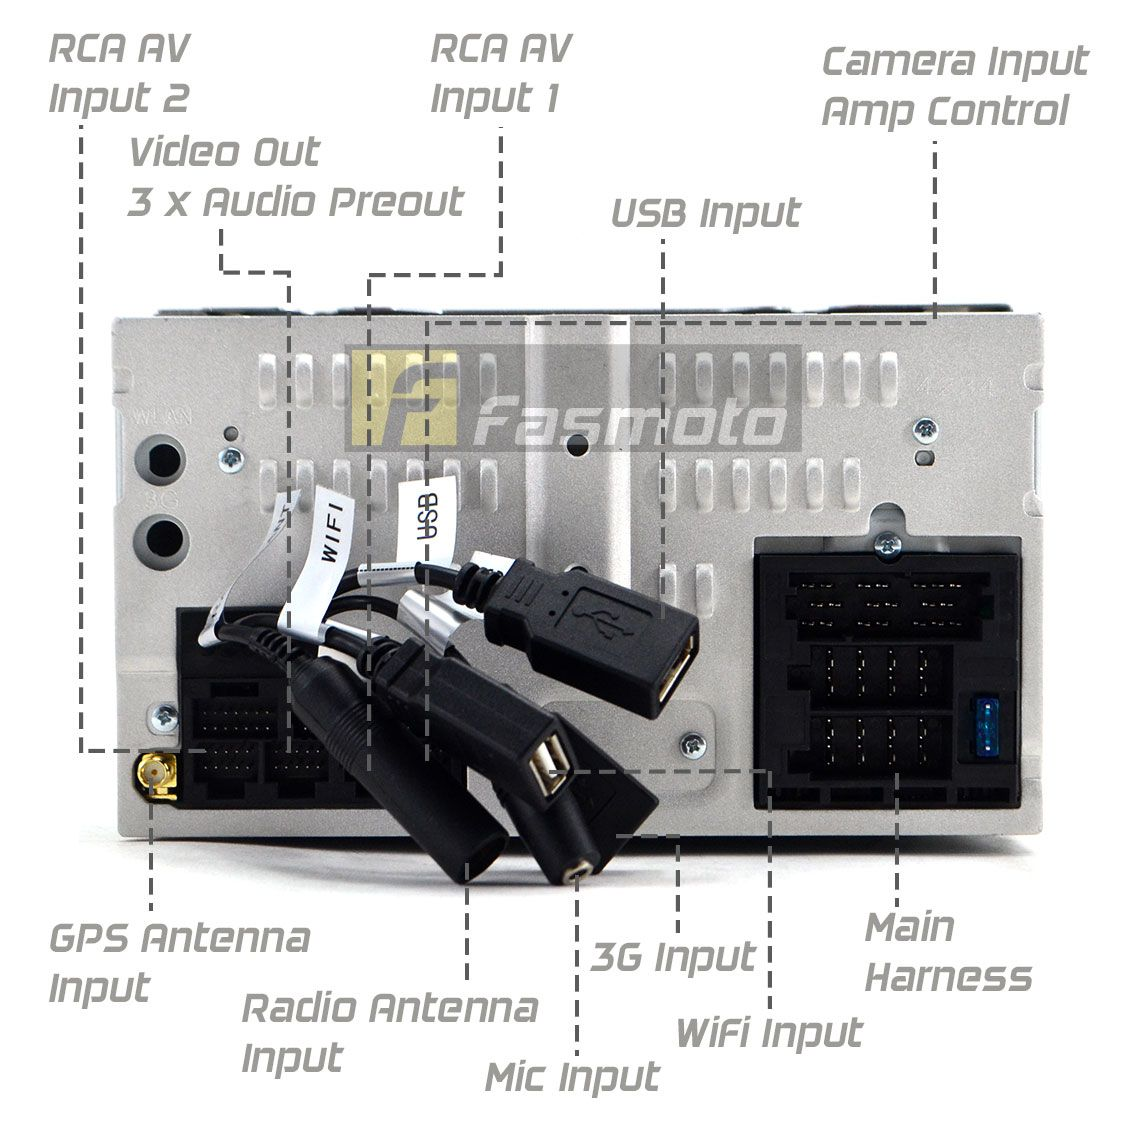 Blaupunkt Kimberley 941 6 75 Double Din Android 4 2 Os Wifi Phonelink Head Unit Blaupunkt Car Audio Car Audio Audio